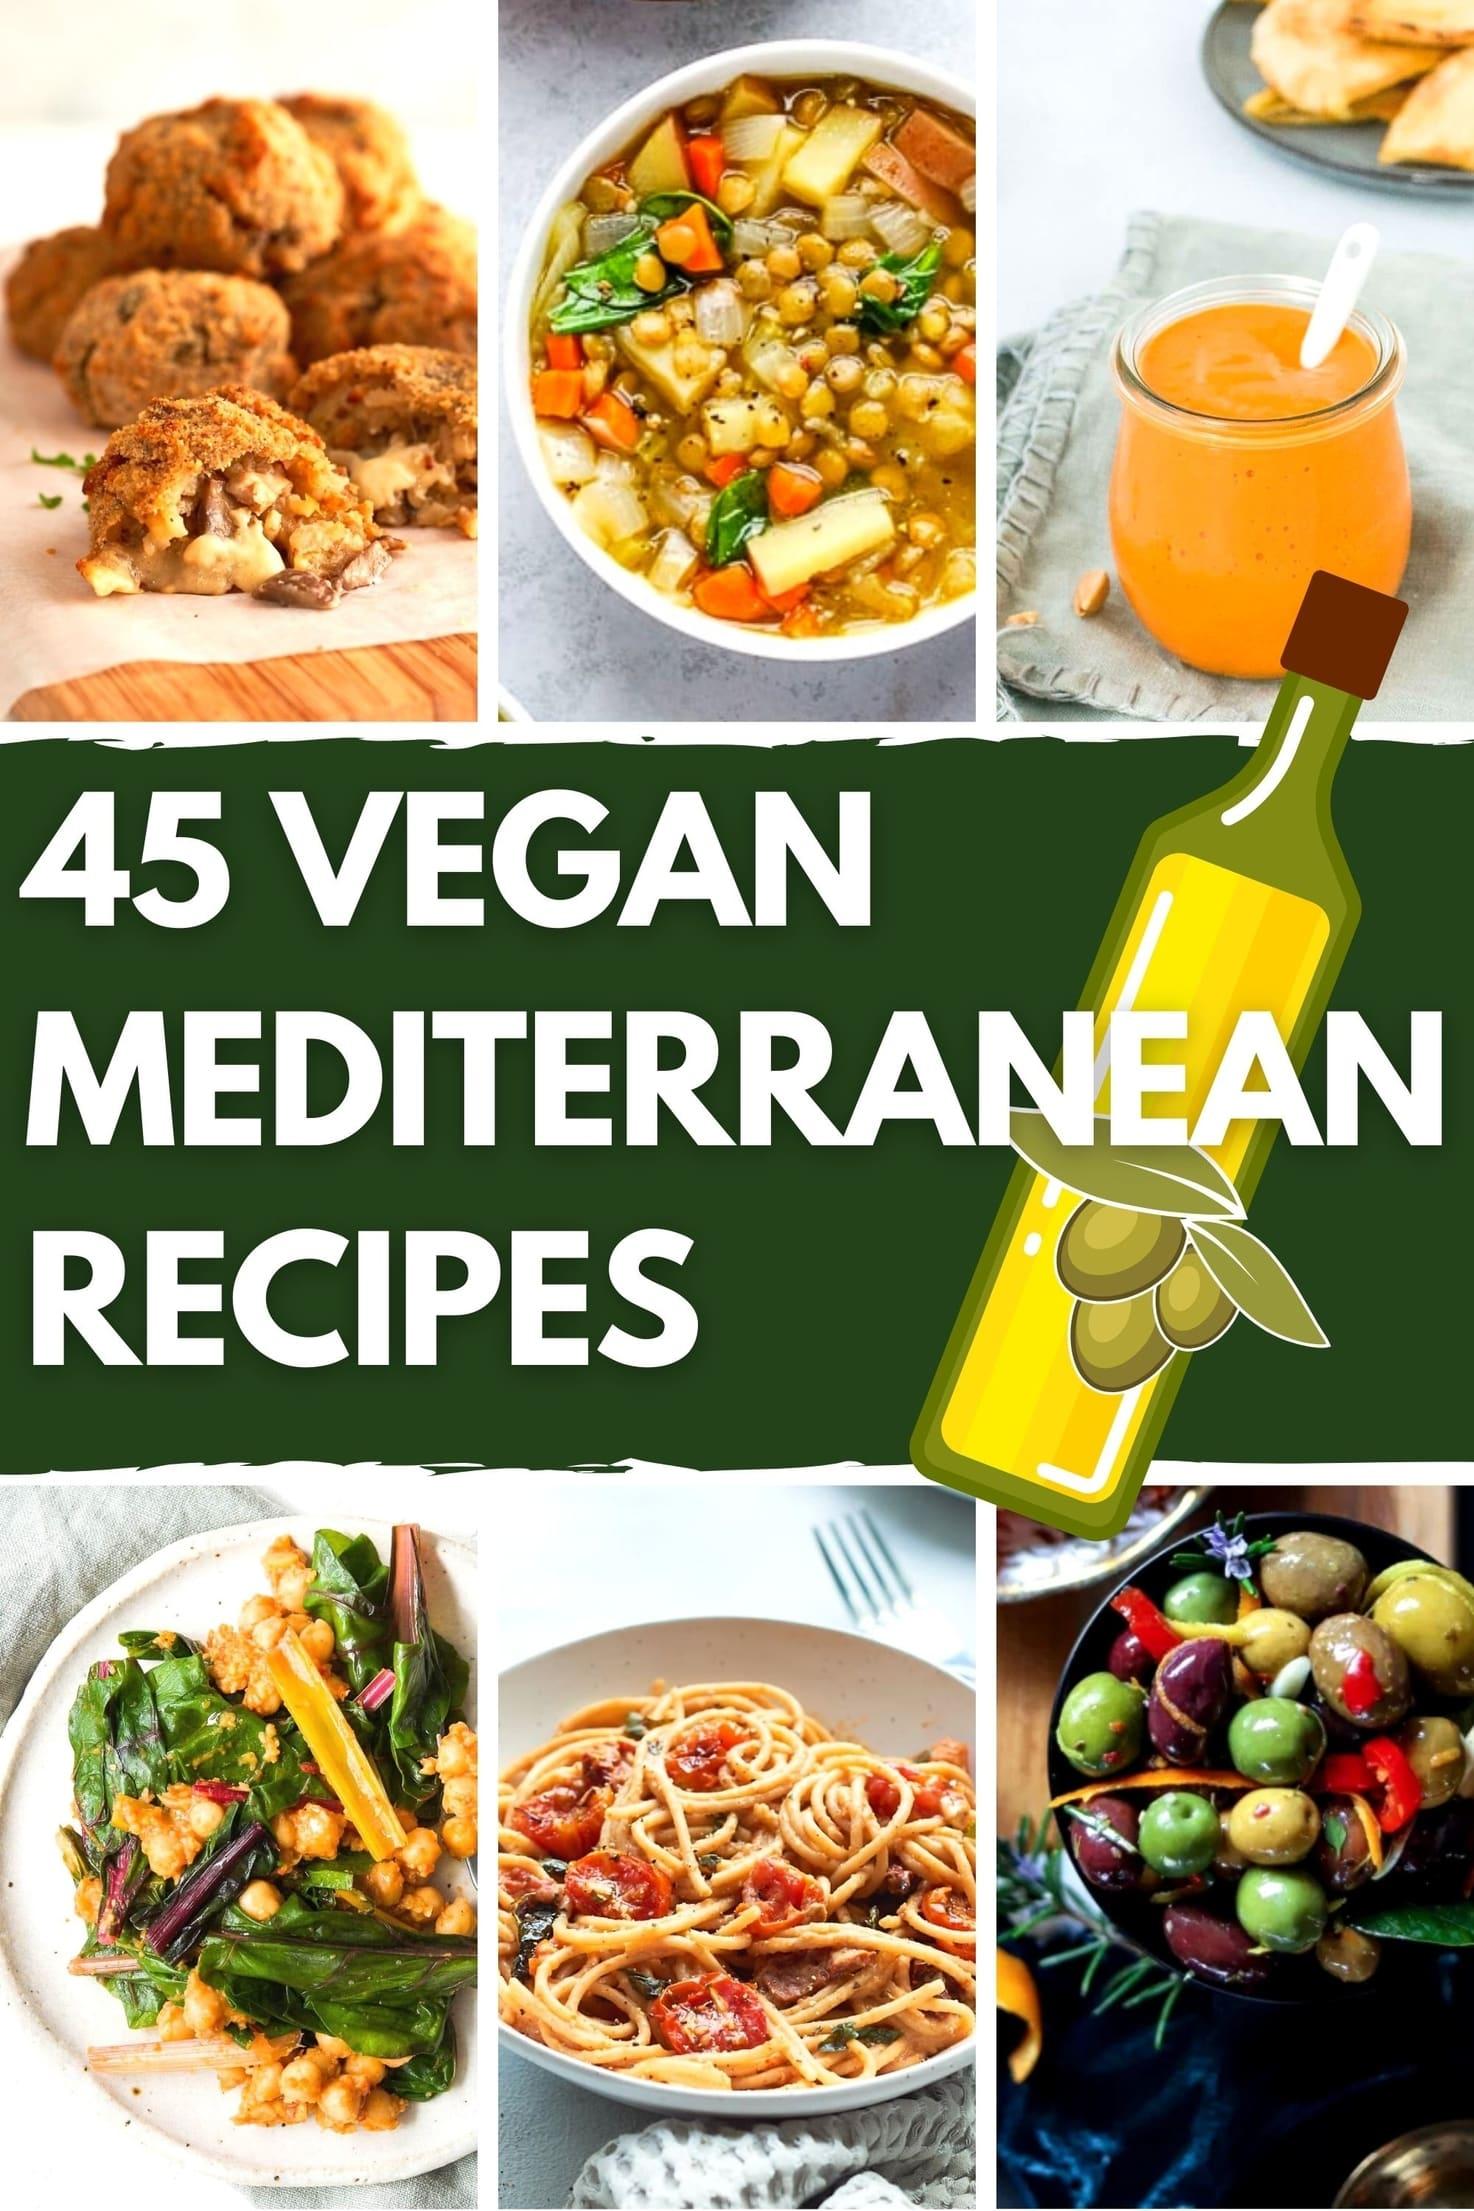 45 Vibrant Vegan Mediterranean Recipes - Title Image   Hurry The Food Up